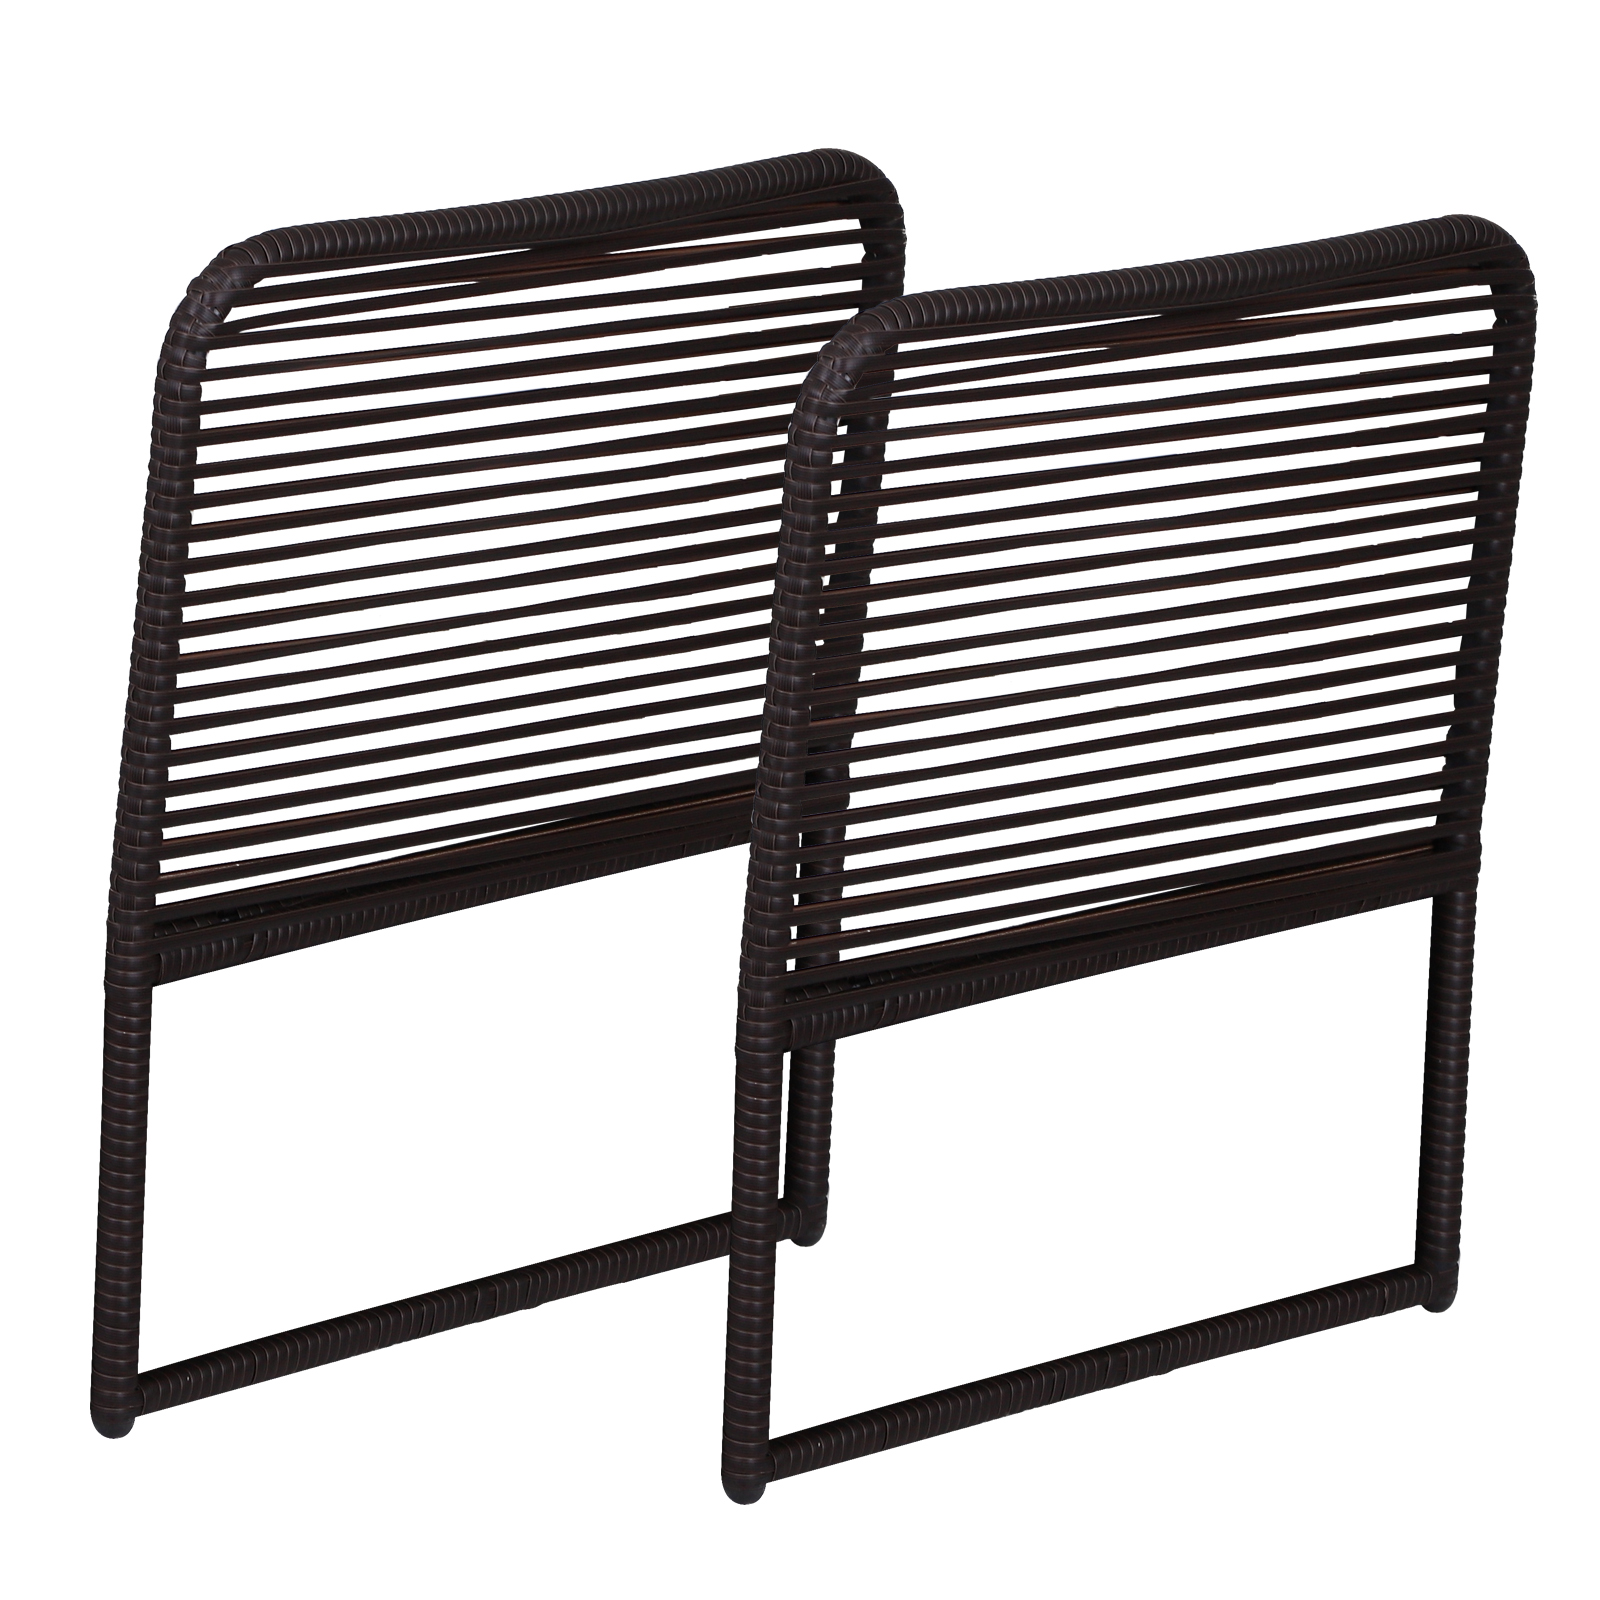 Outsunny Armrests Parts 2 PCs Outdoor Garden Furniture Rattan 63x60x6 Cm